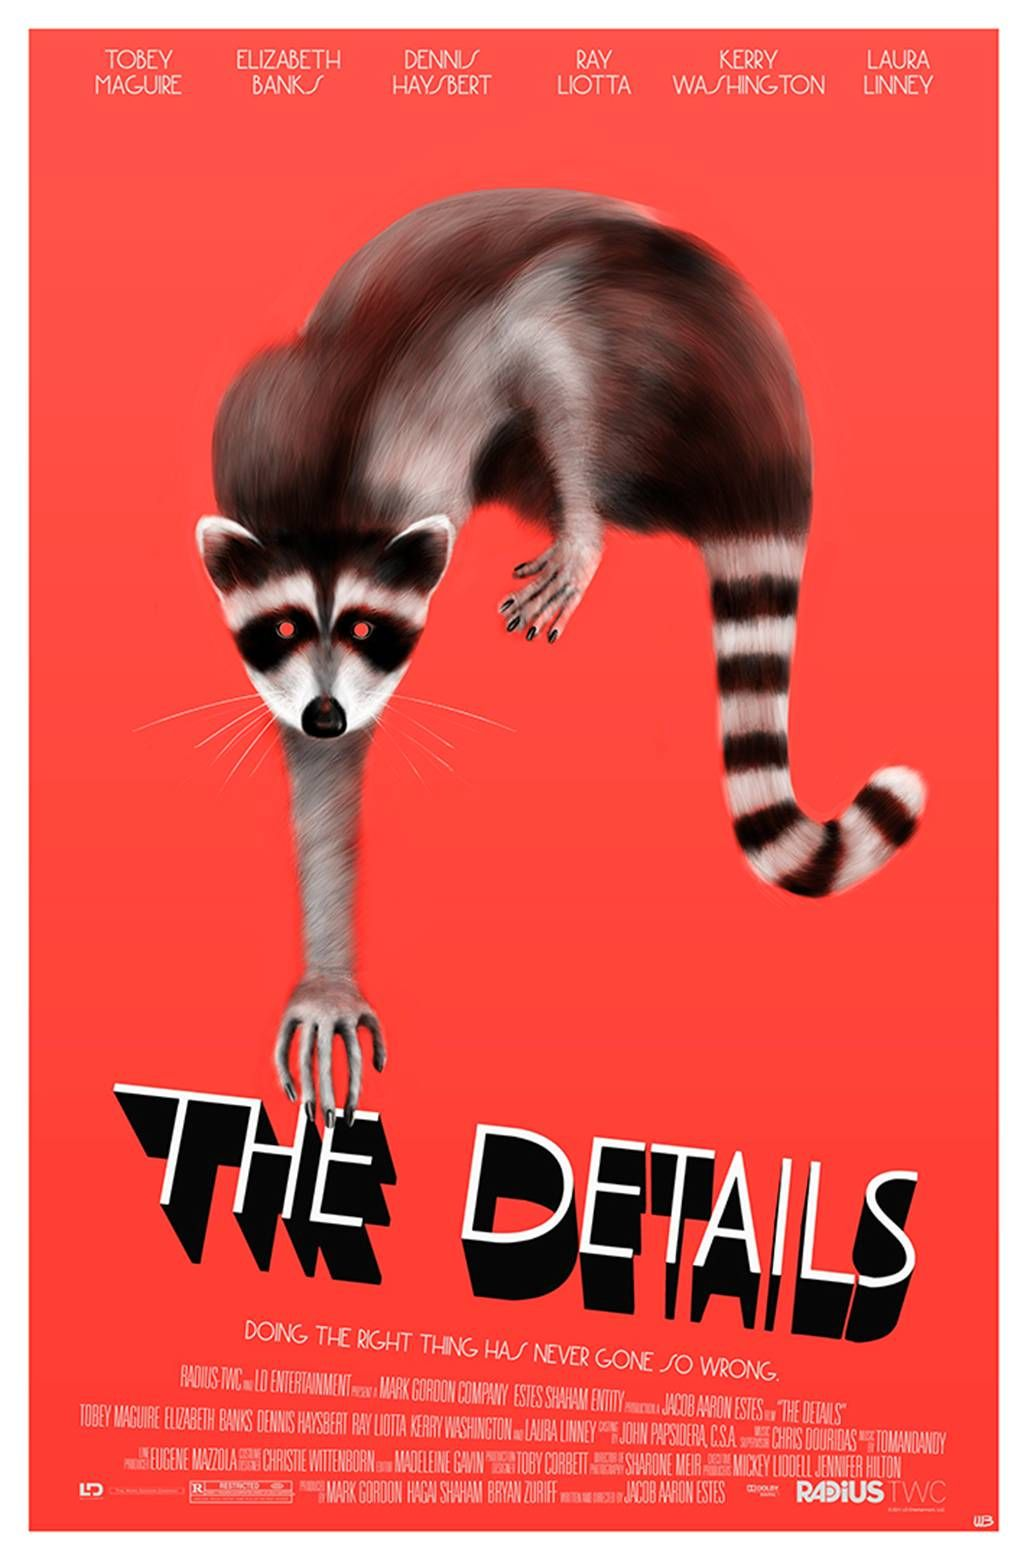 The Details Movie posters, 2012 movie, movie